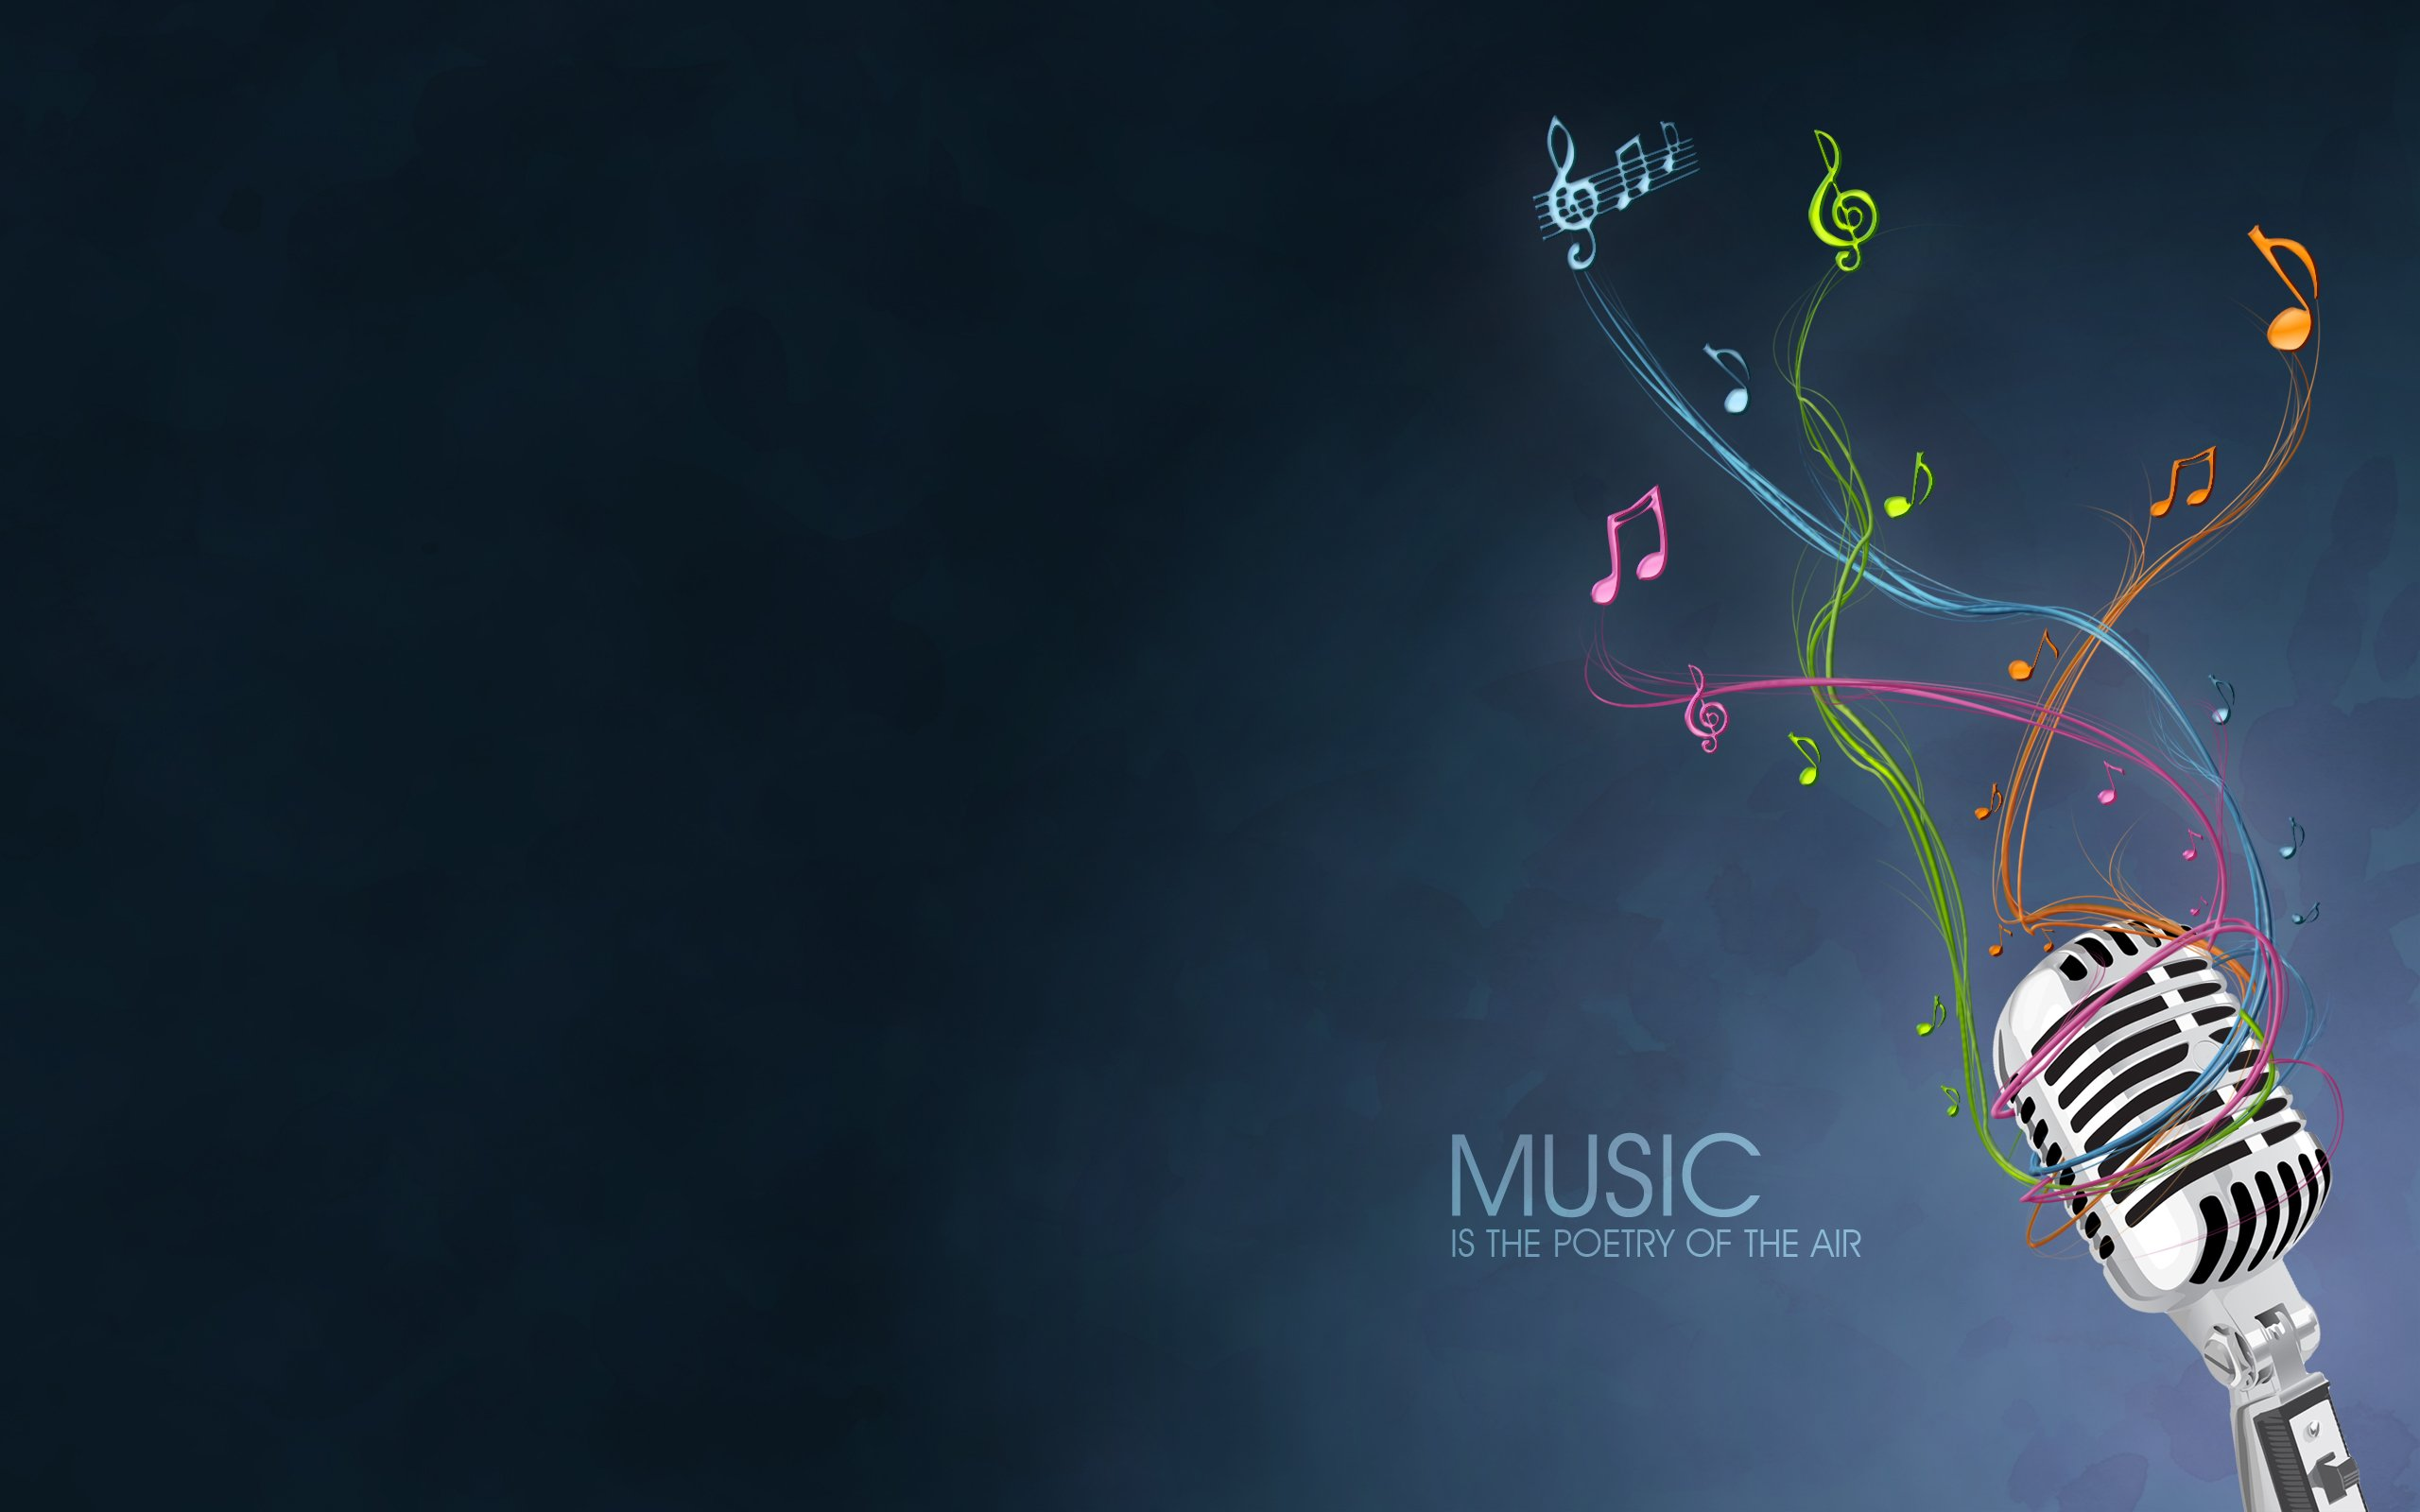 Hd wallpaper music - Music Notes Wallpaper 9815 Hd Wallpapers In Music Imagesci Com